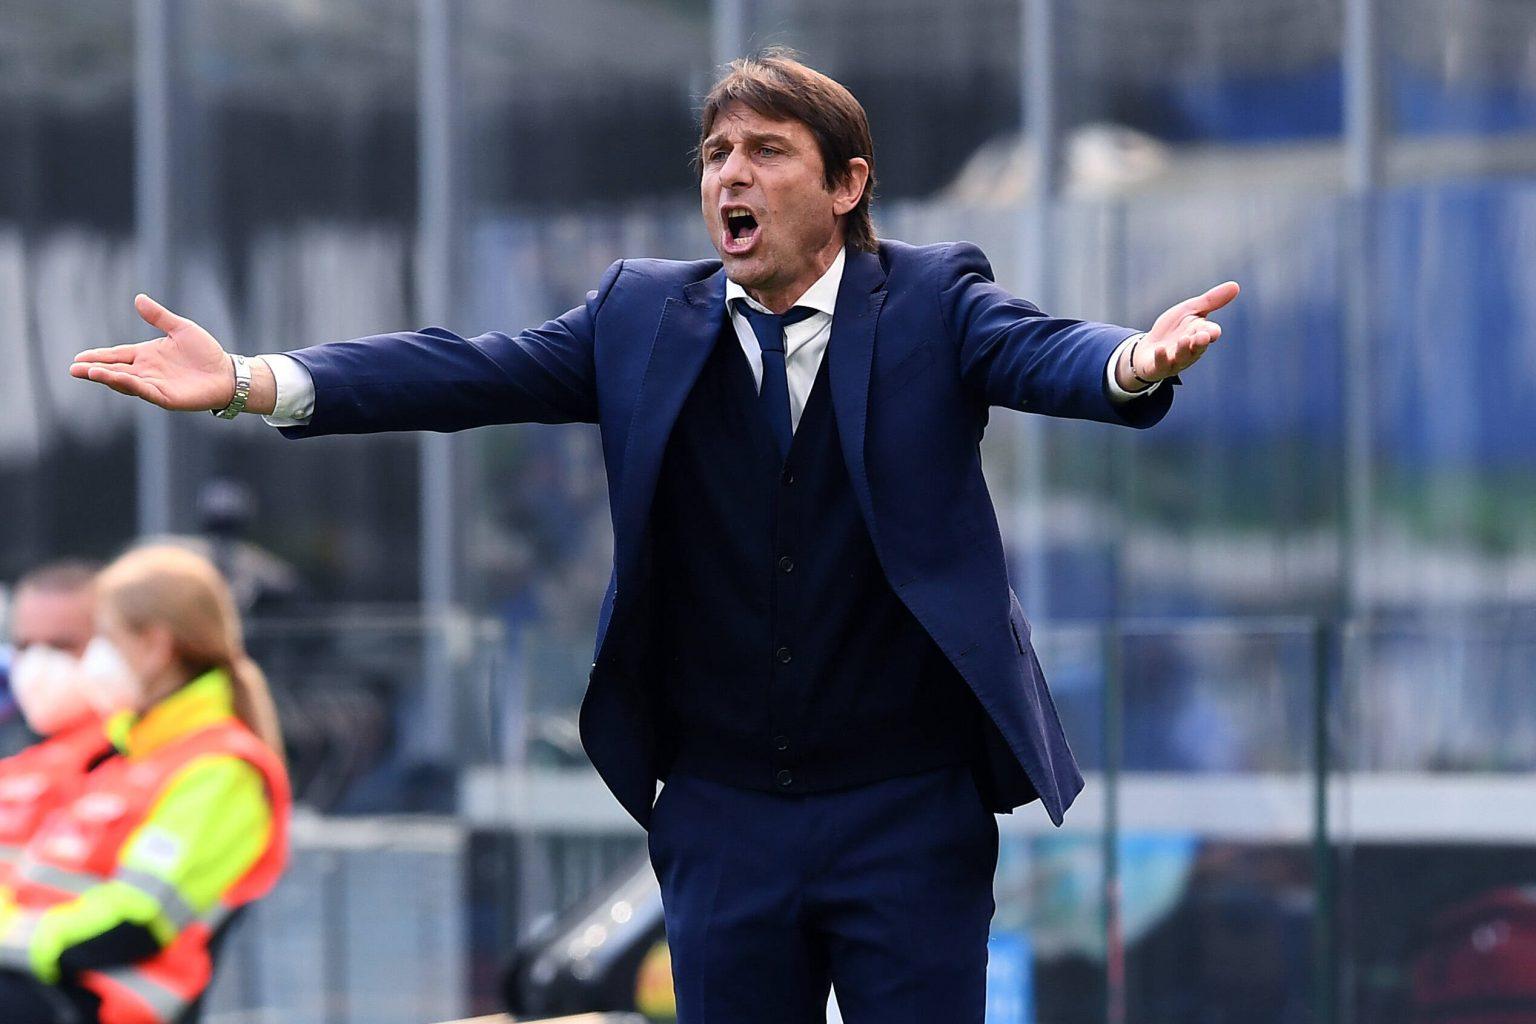 Antonio Conte left Inter